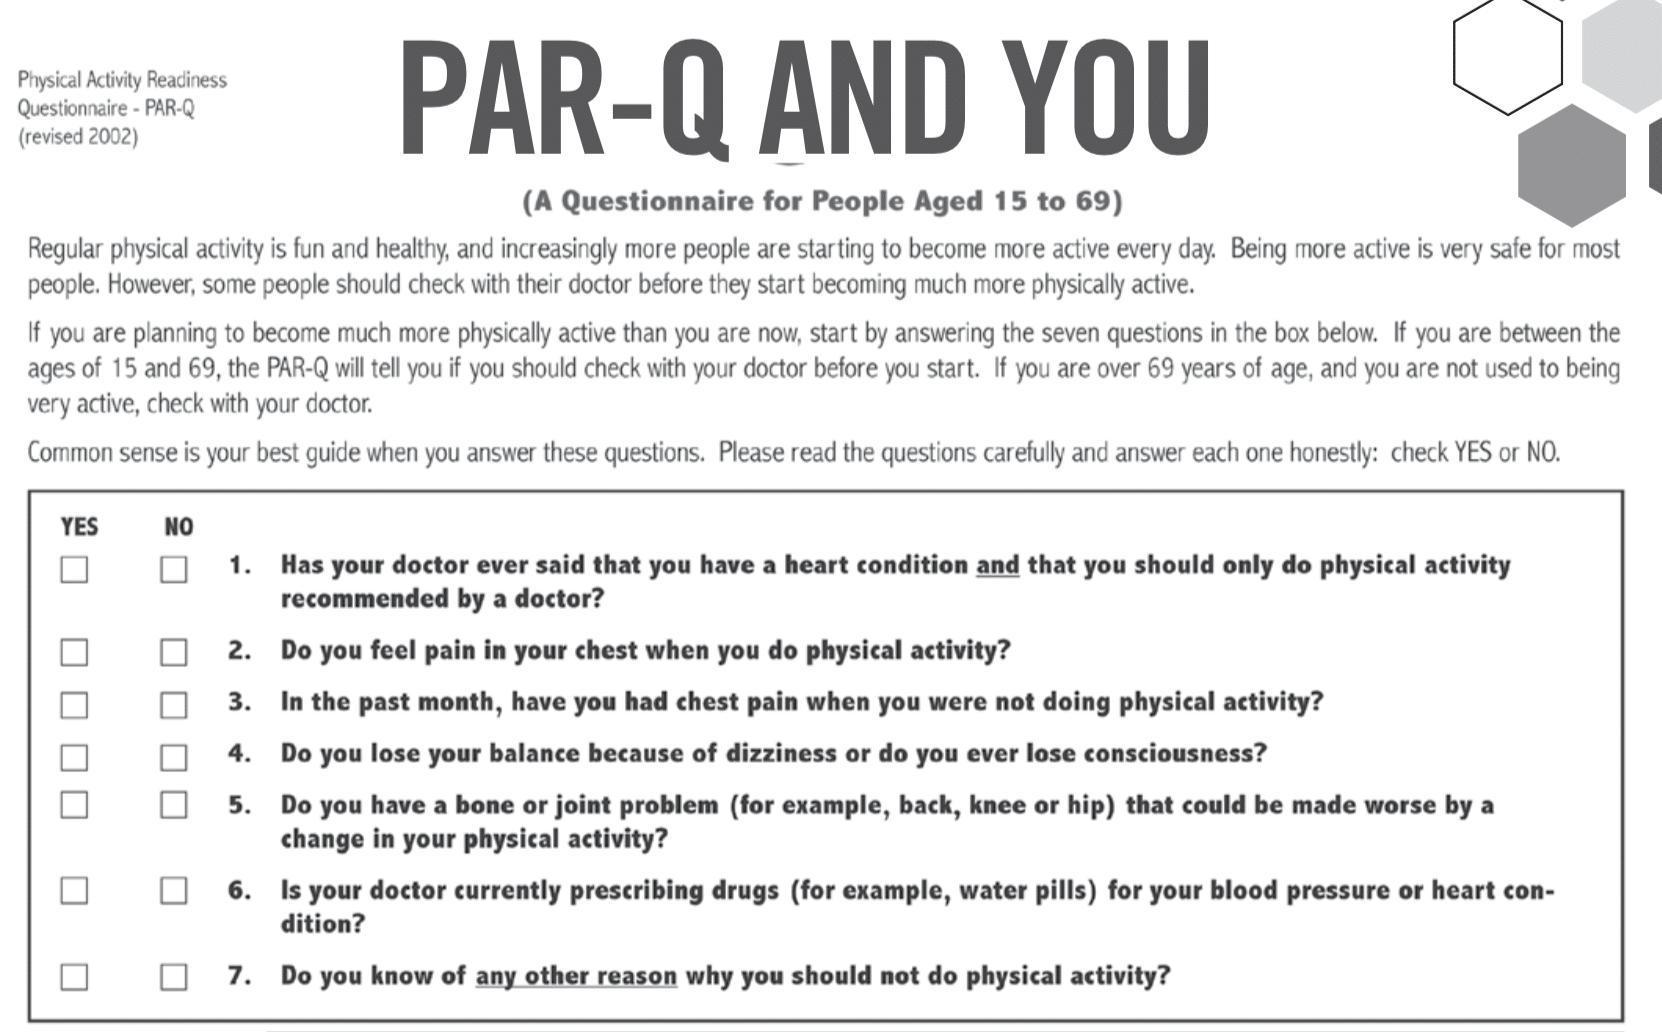 PAR-Q Health Form